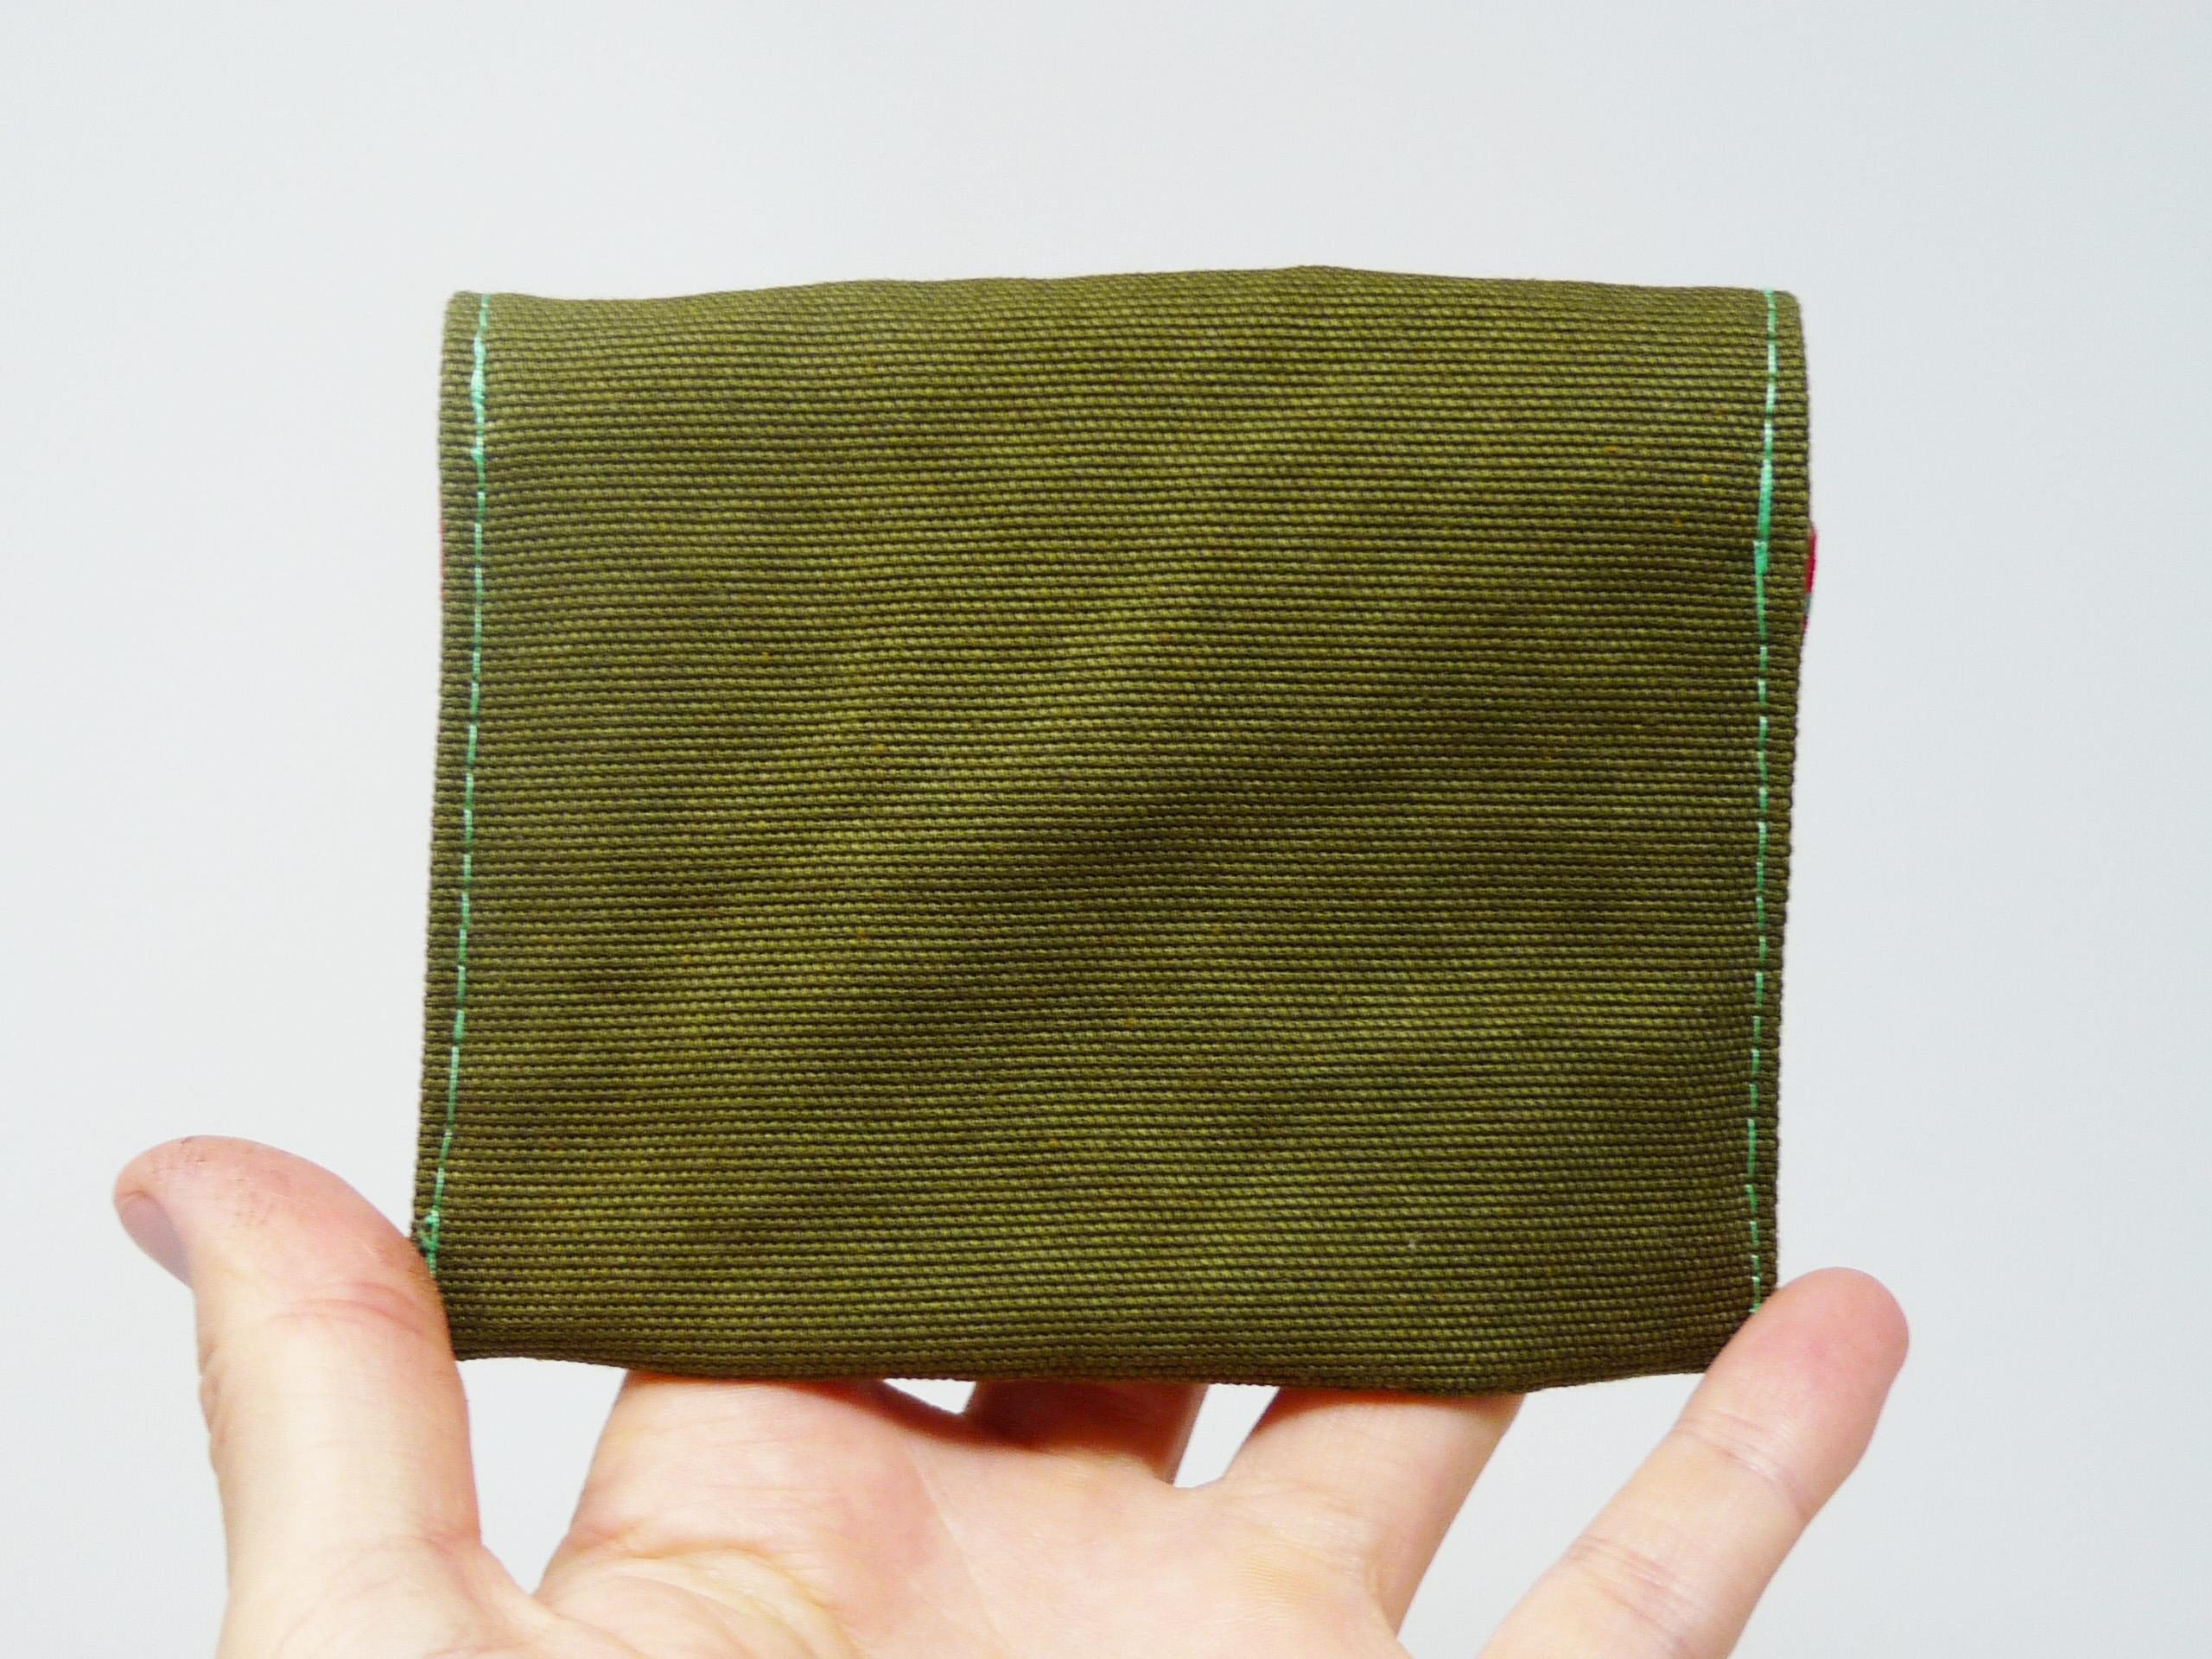 Porte-monnaie en tissu kaki